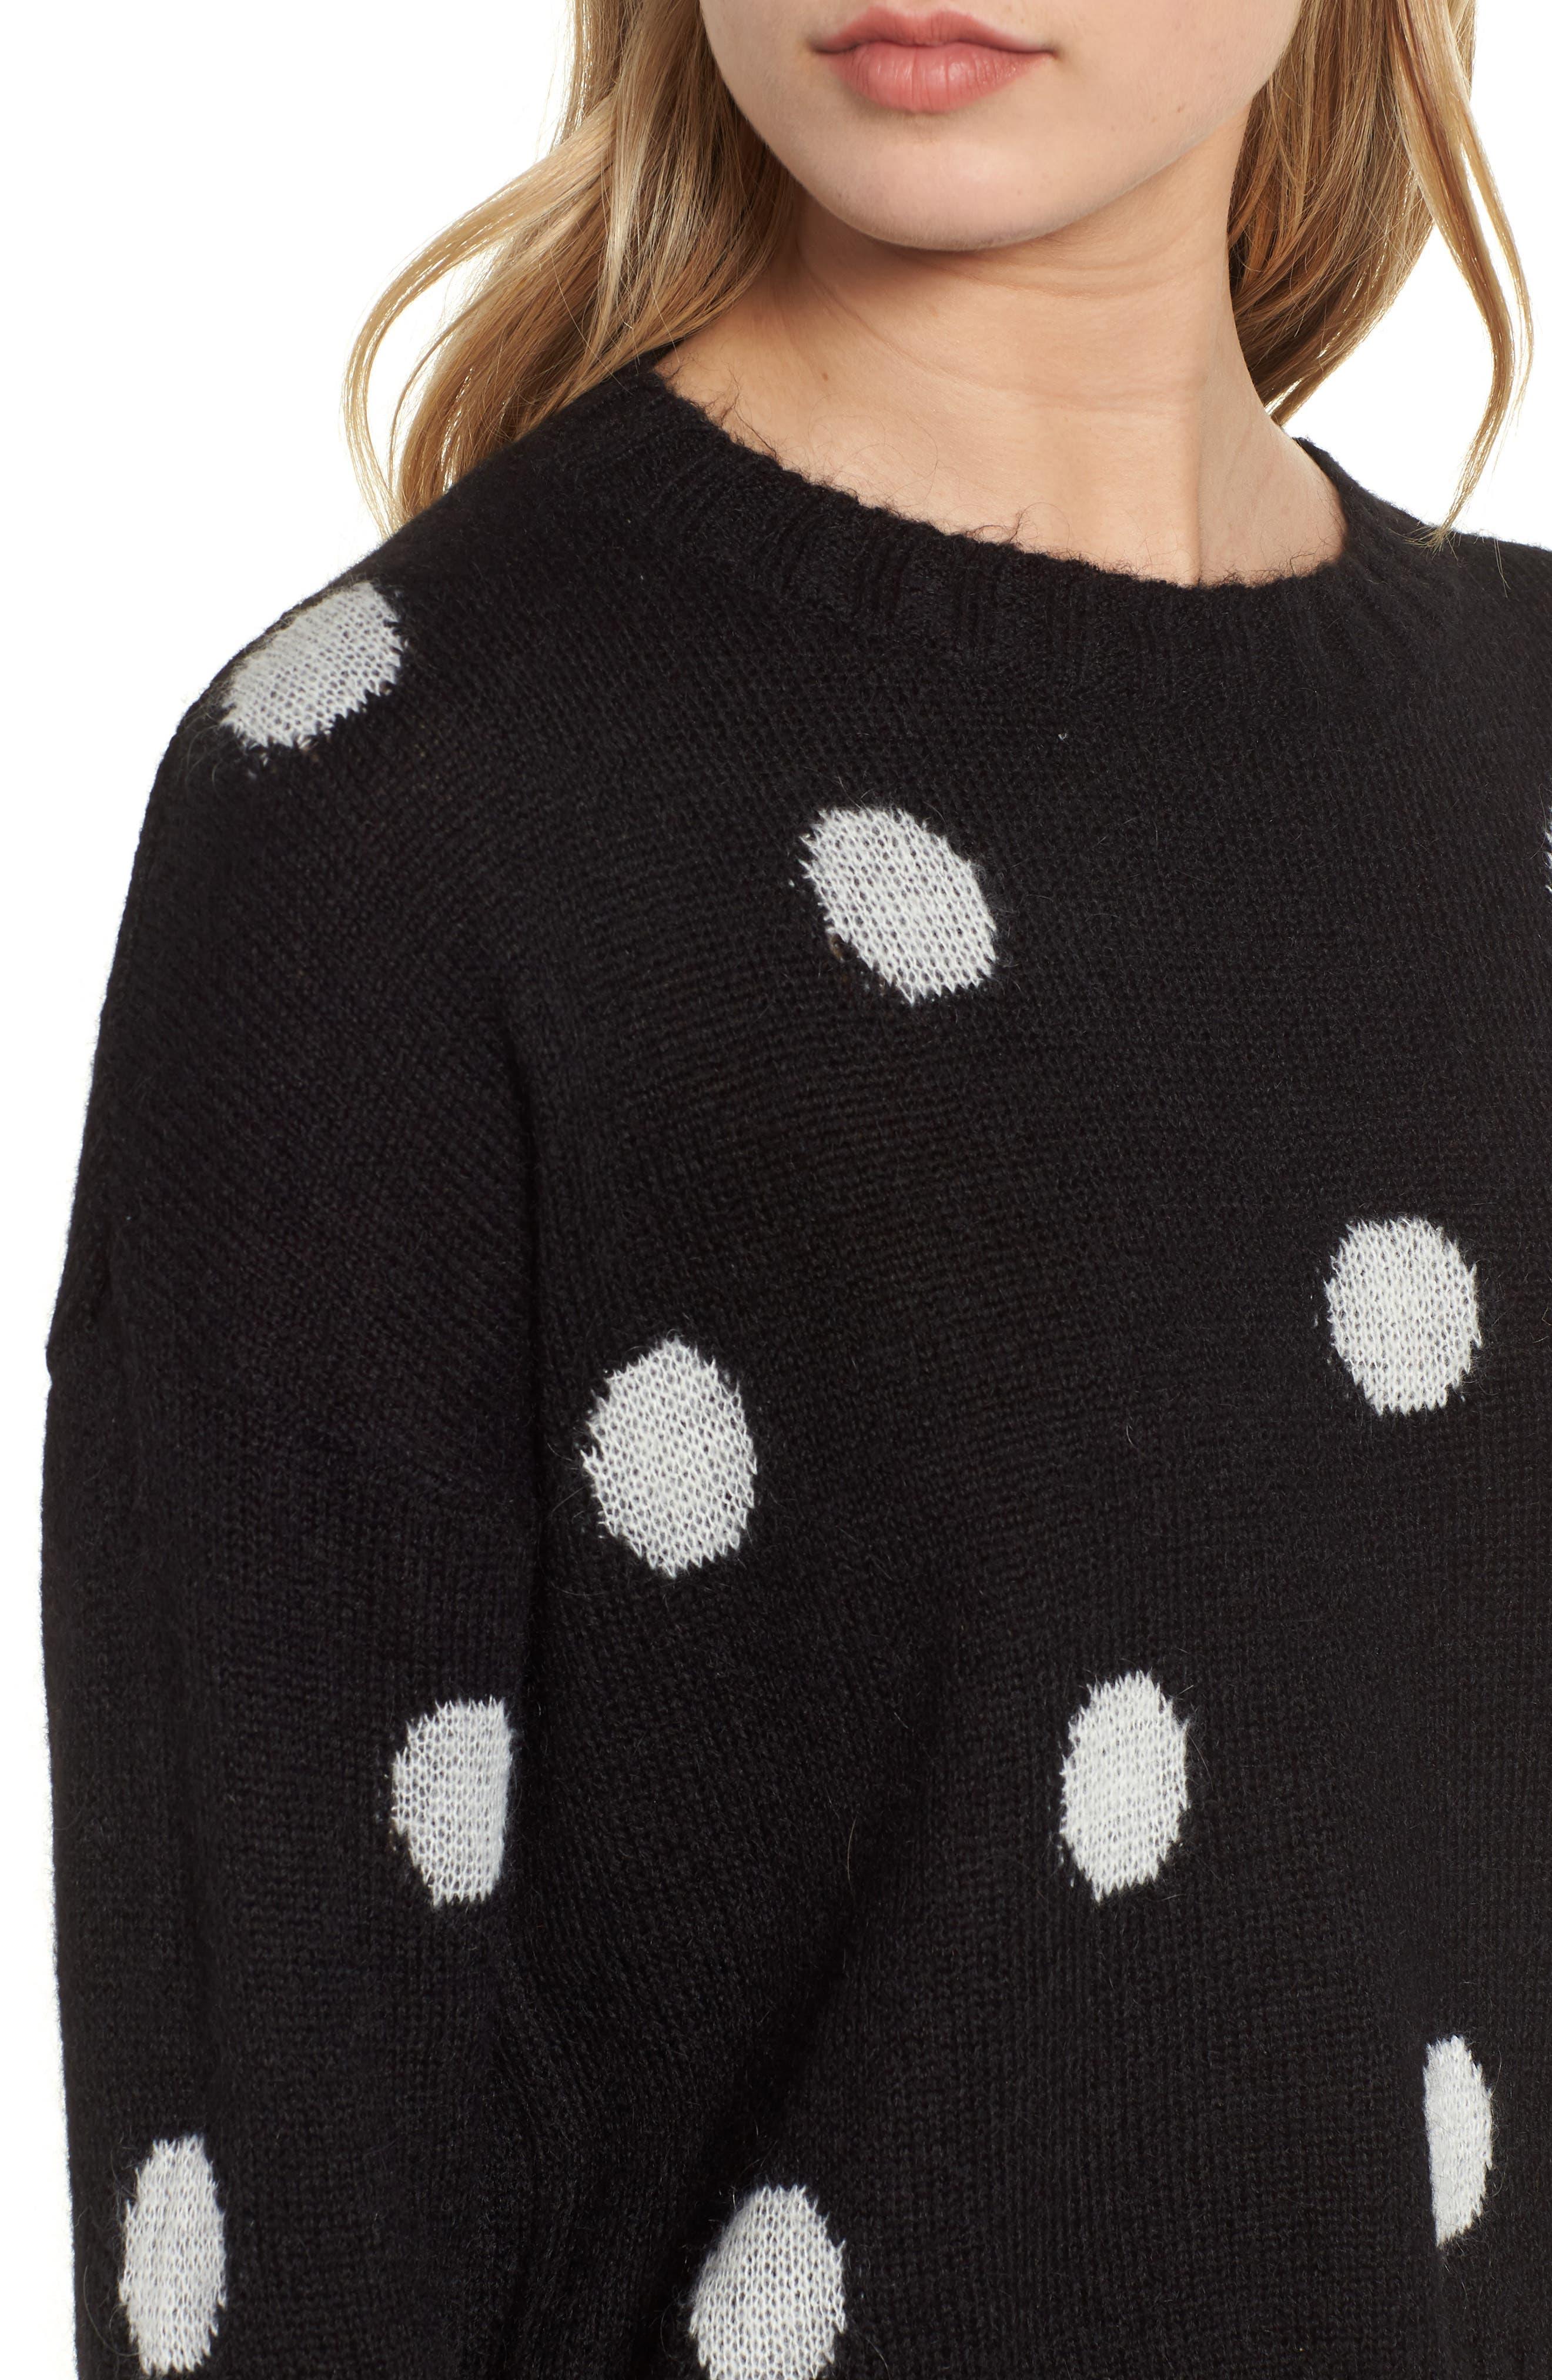 Perci Sweater,                             Alternate thumbnail 4, color,                             BLACK/ IVORY POLKA DOT